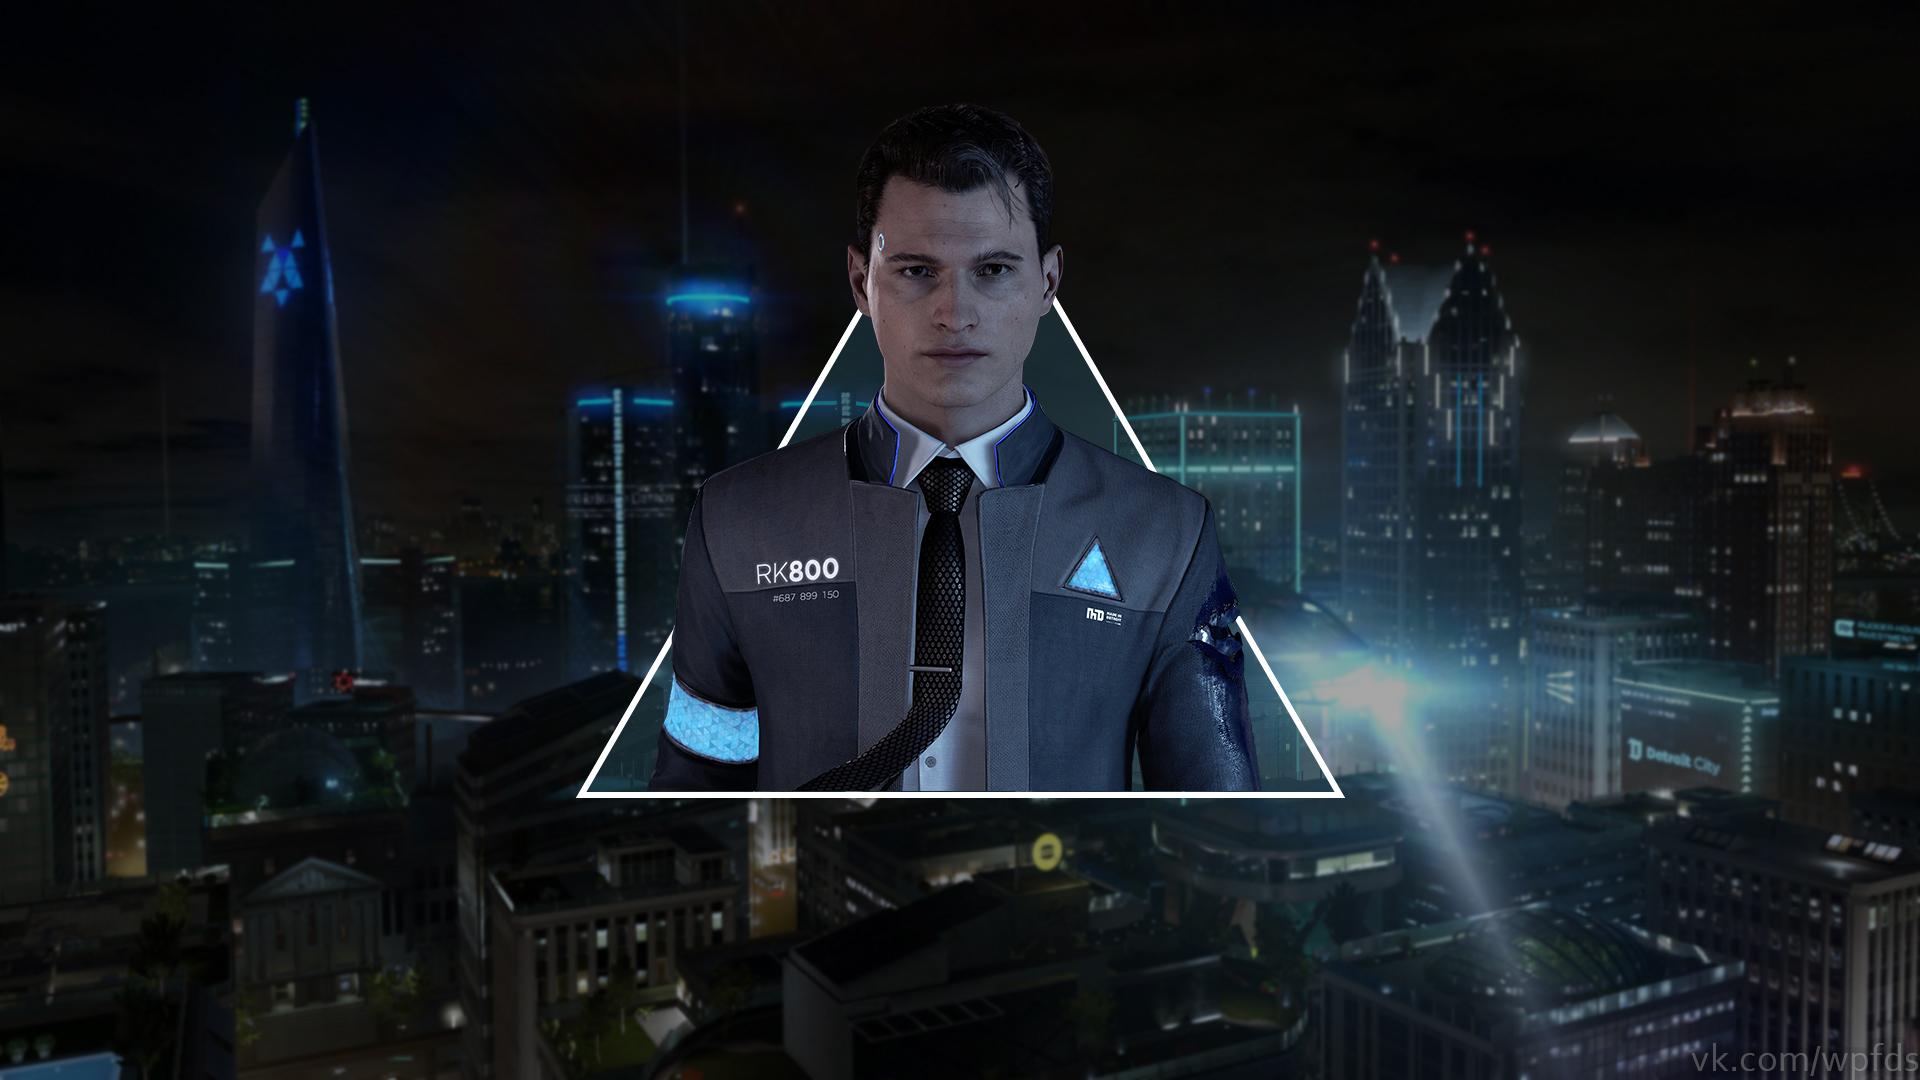 Detroit Become Human Connor Wallpaper: Wallpaper : Detroit Become Human, Connor, Video Games